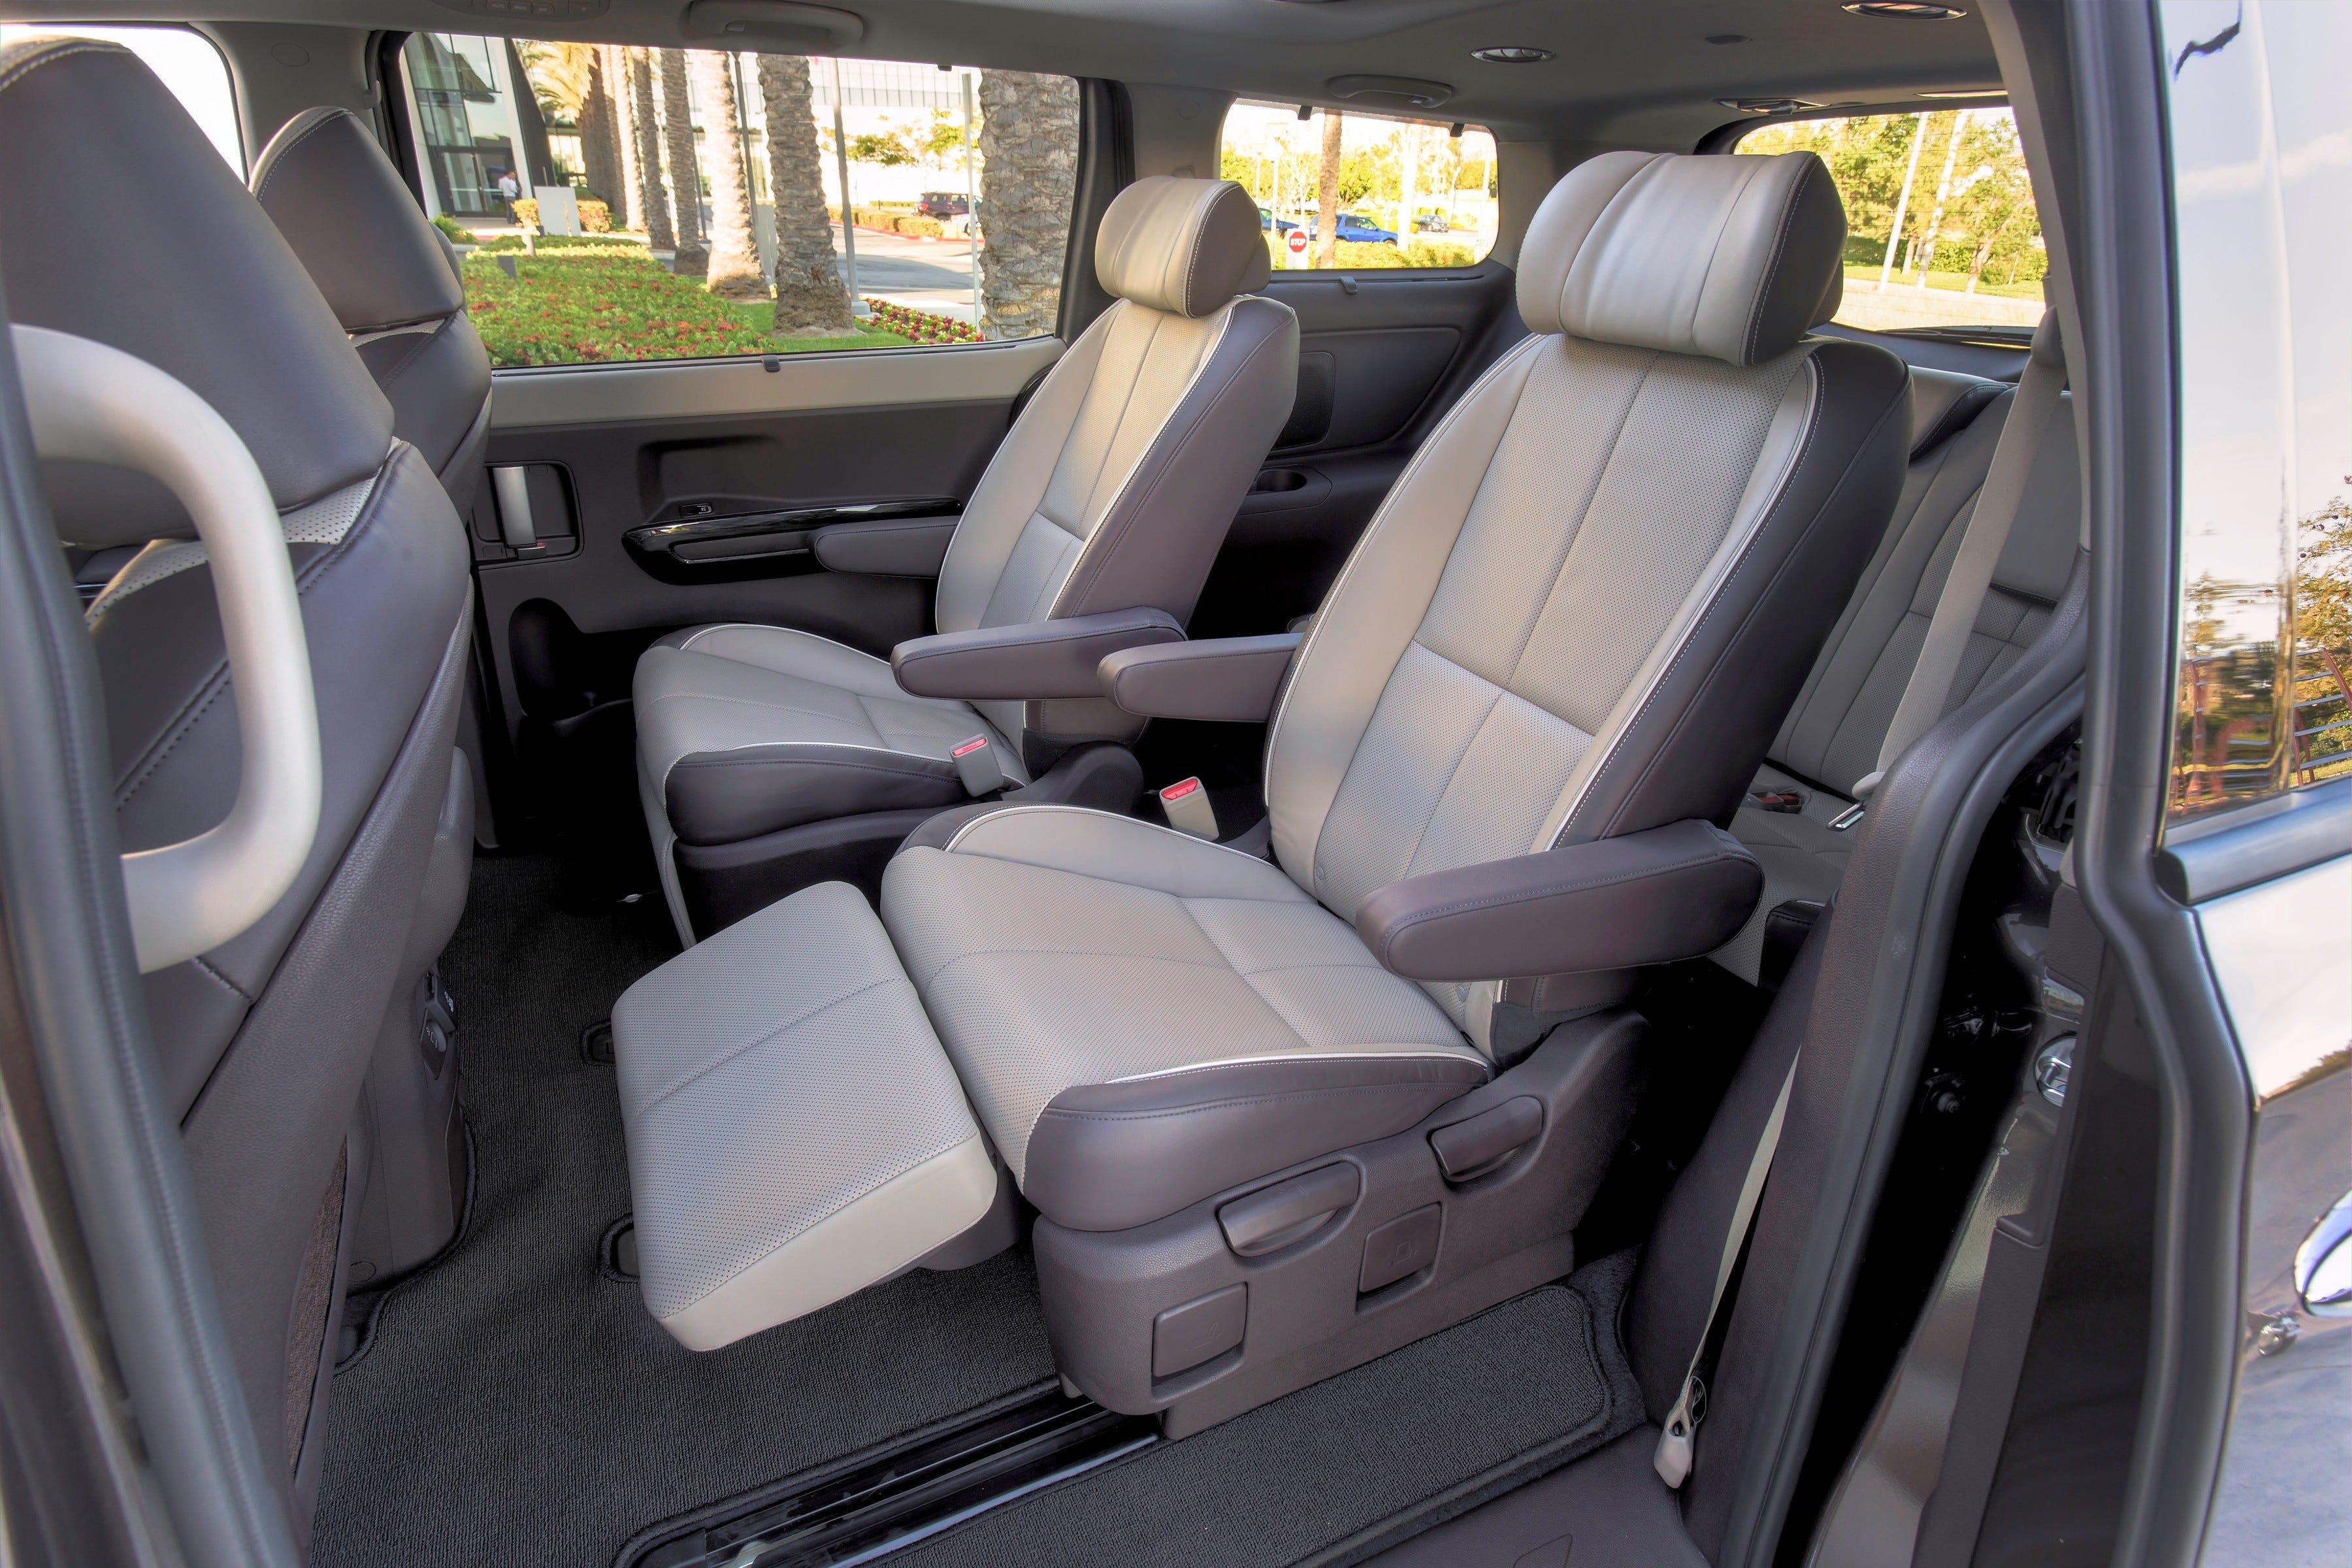 Second-row reclining lounge seats in high-end models & Test Drive: Kia Sedona van has 1st-class seating islam-shia.org